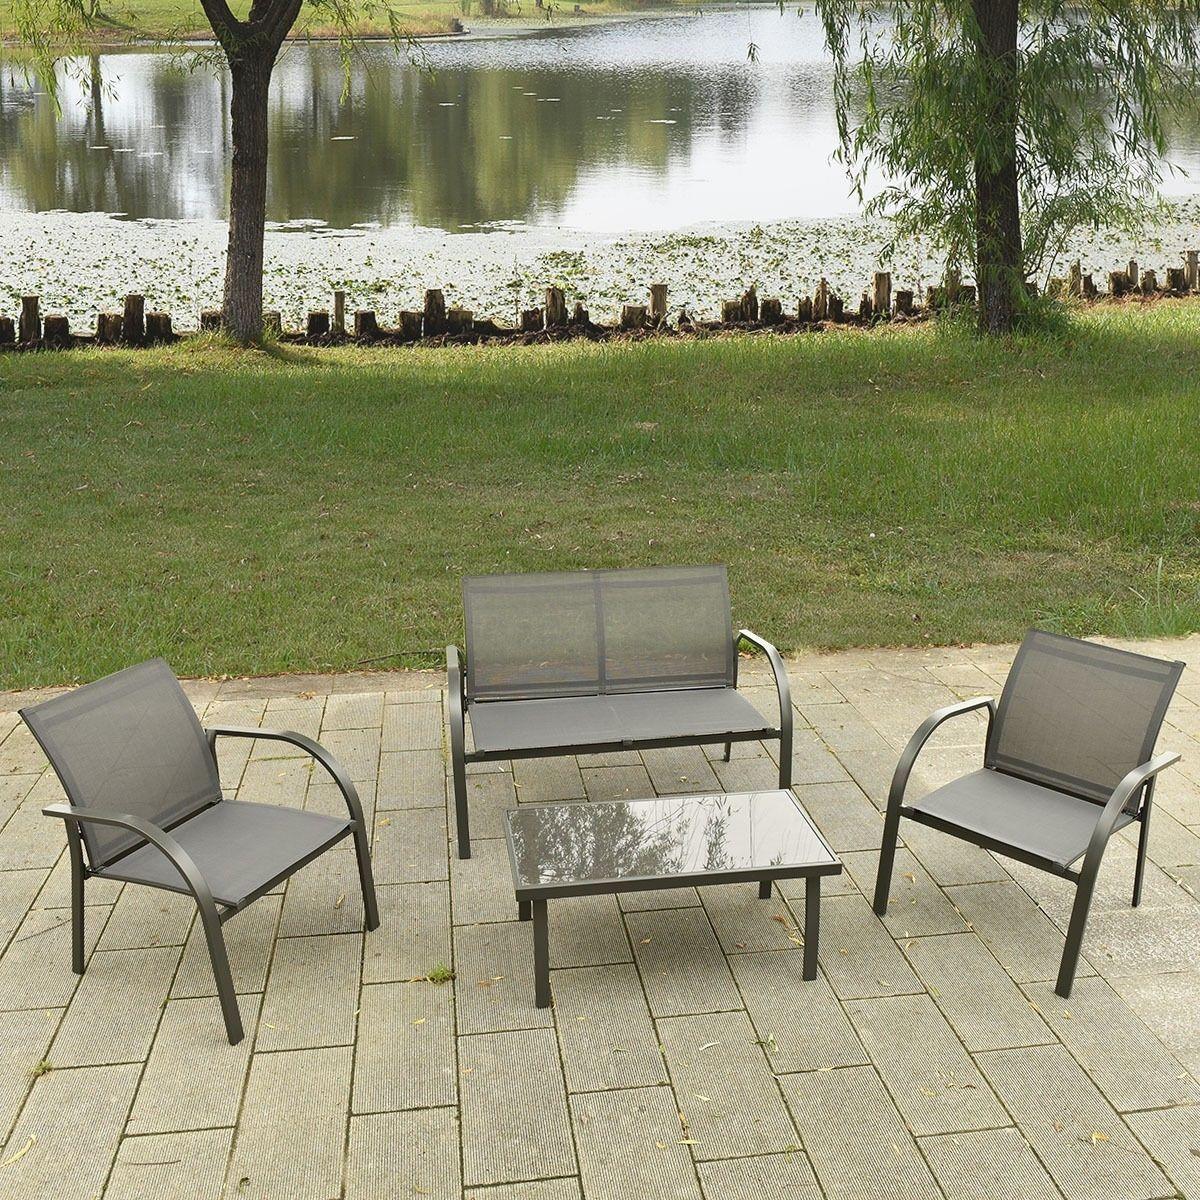 4 Pc Patio Furniture Outdoor Lawn Yard Sofa Chairs Coffee Table Garden Set Seat